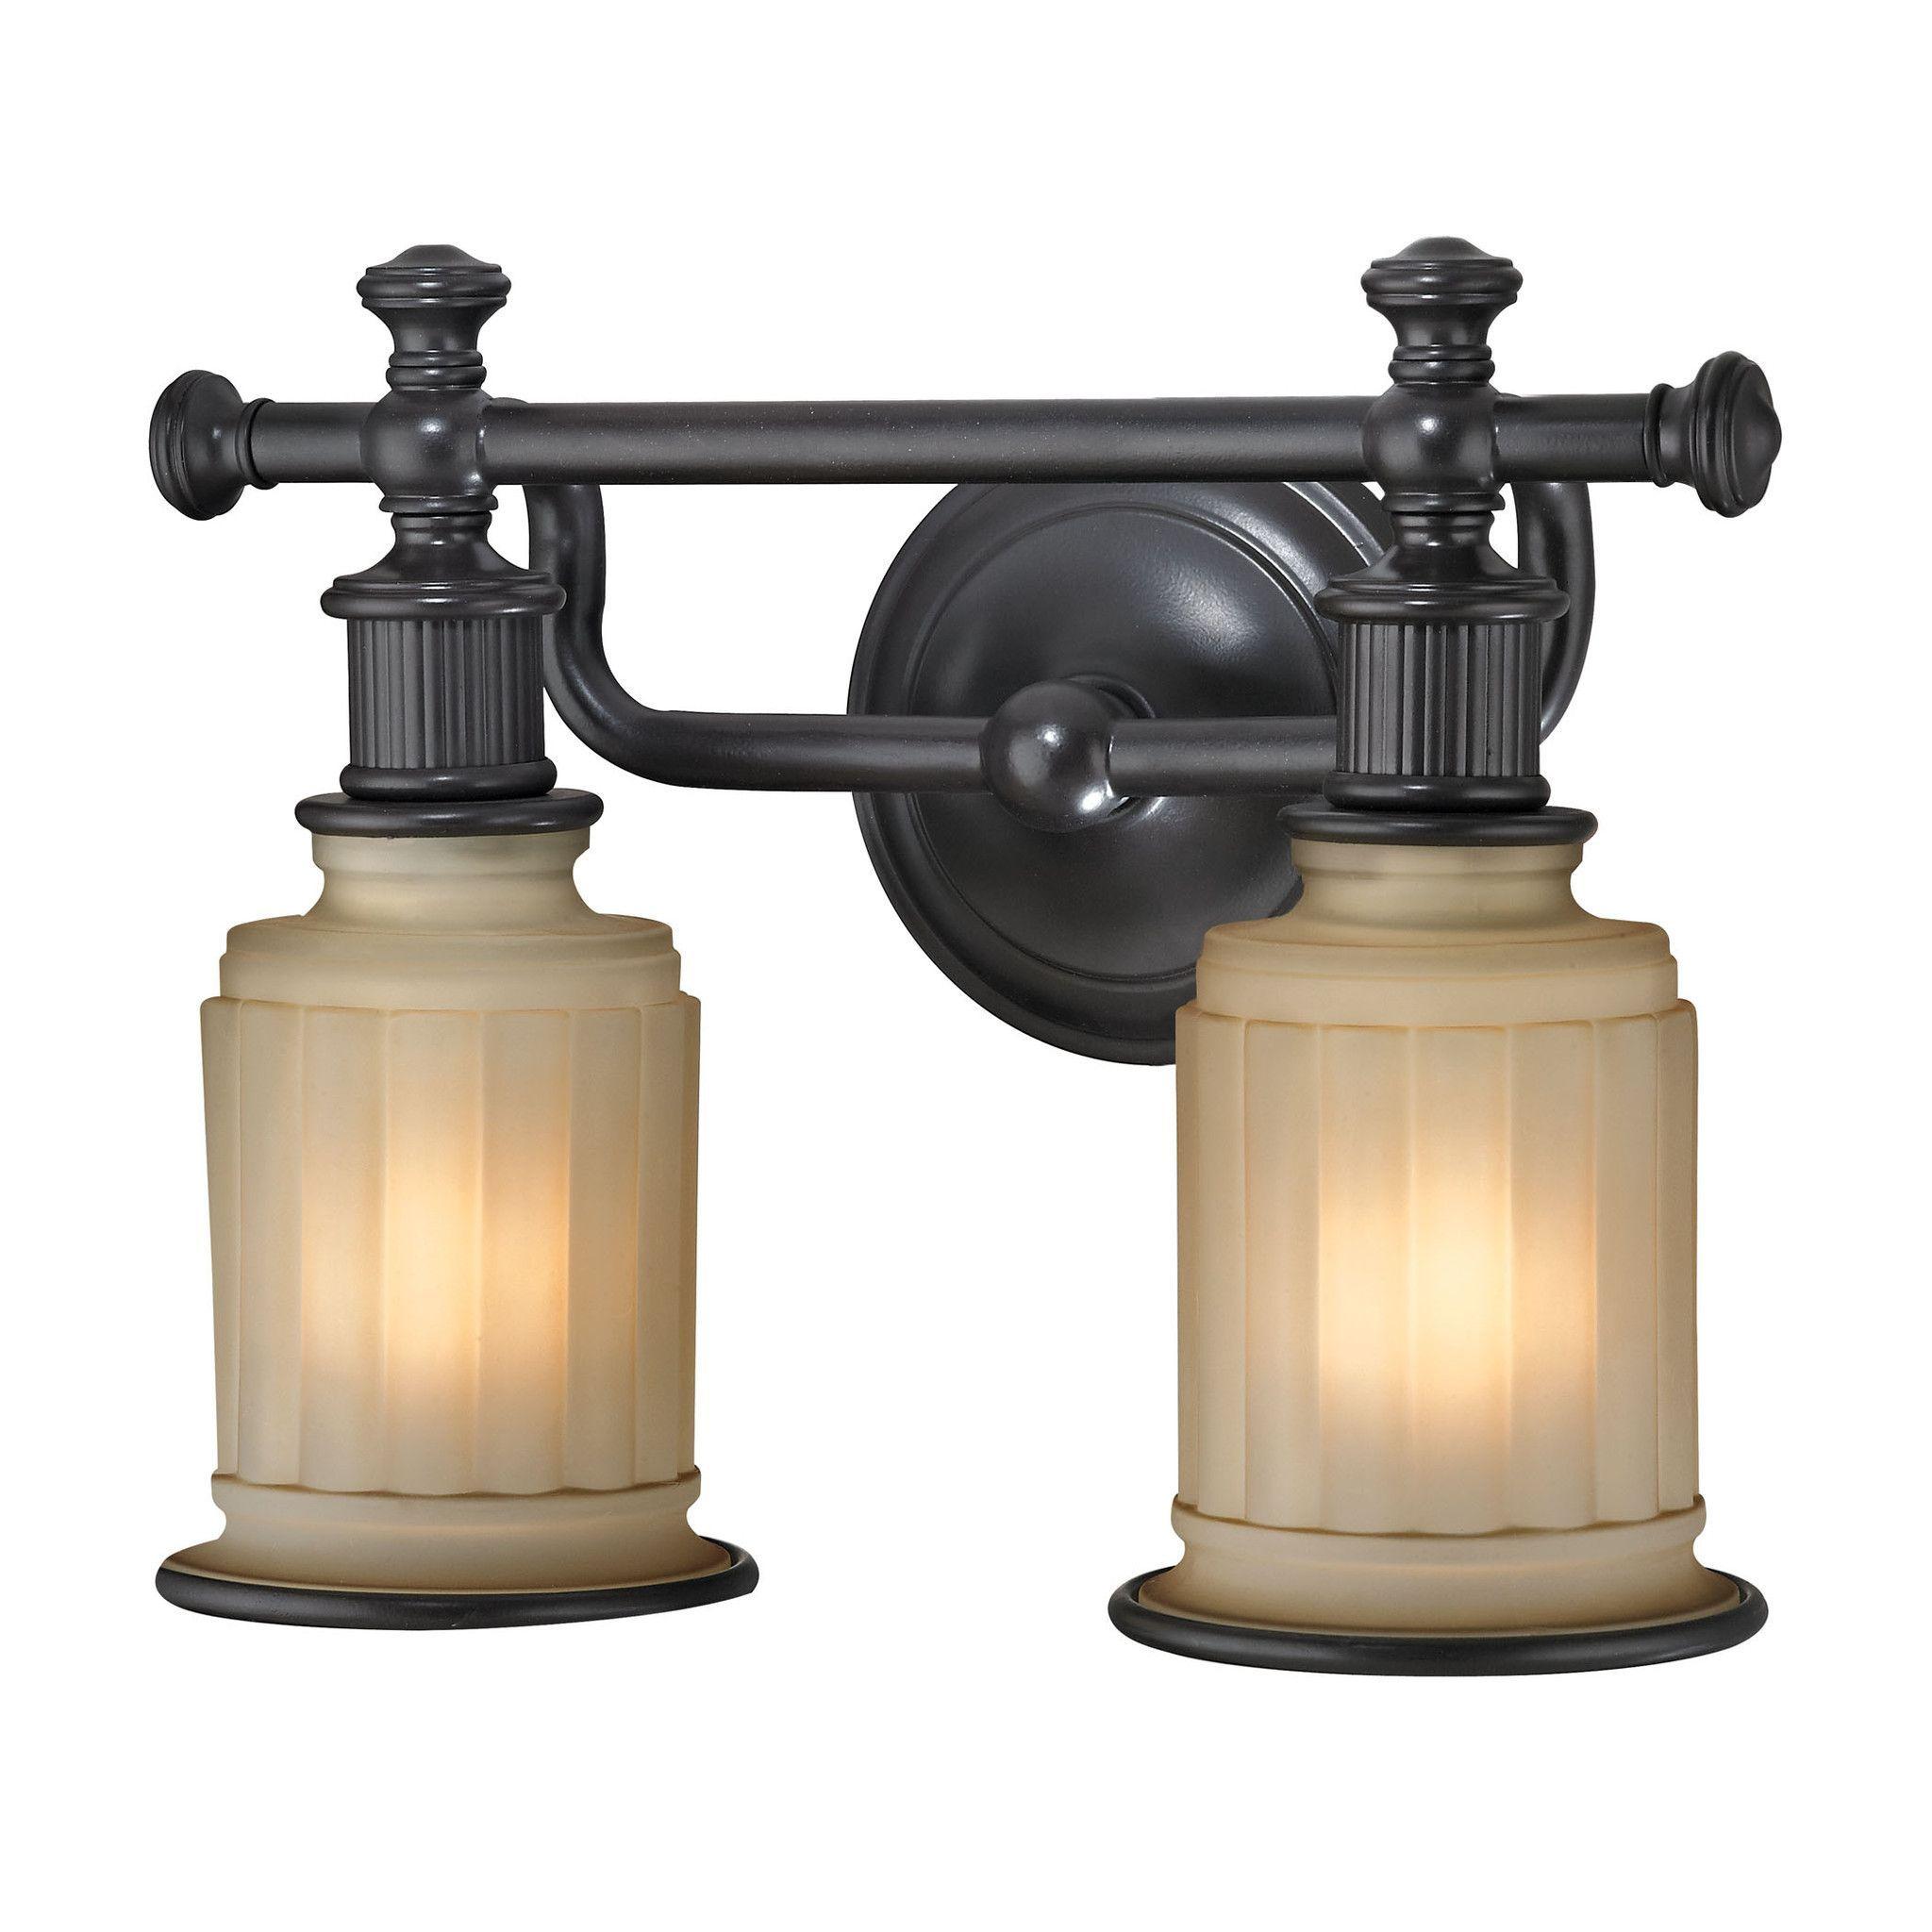 depot oil house home venetian chandelier fixture and pendant lights light bronze faucet fixtures bathroom ceiling marvellous lighting rubbed vanity accessories